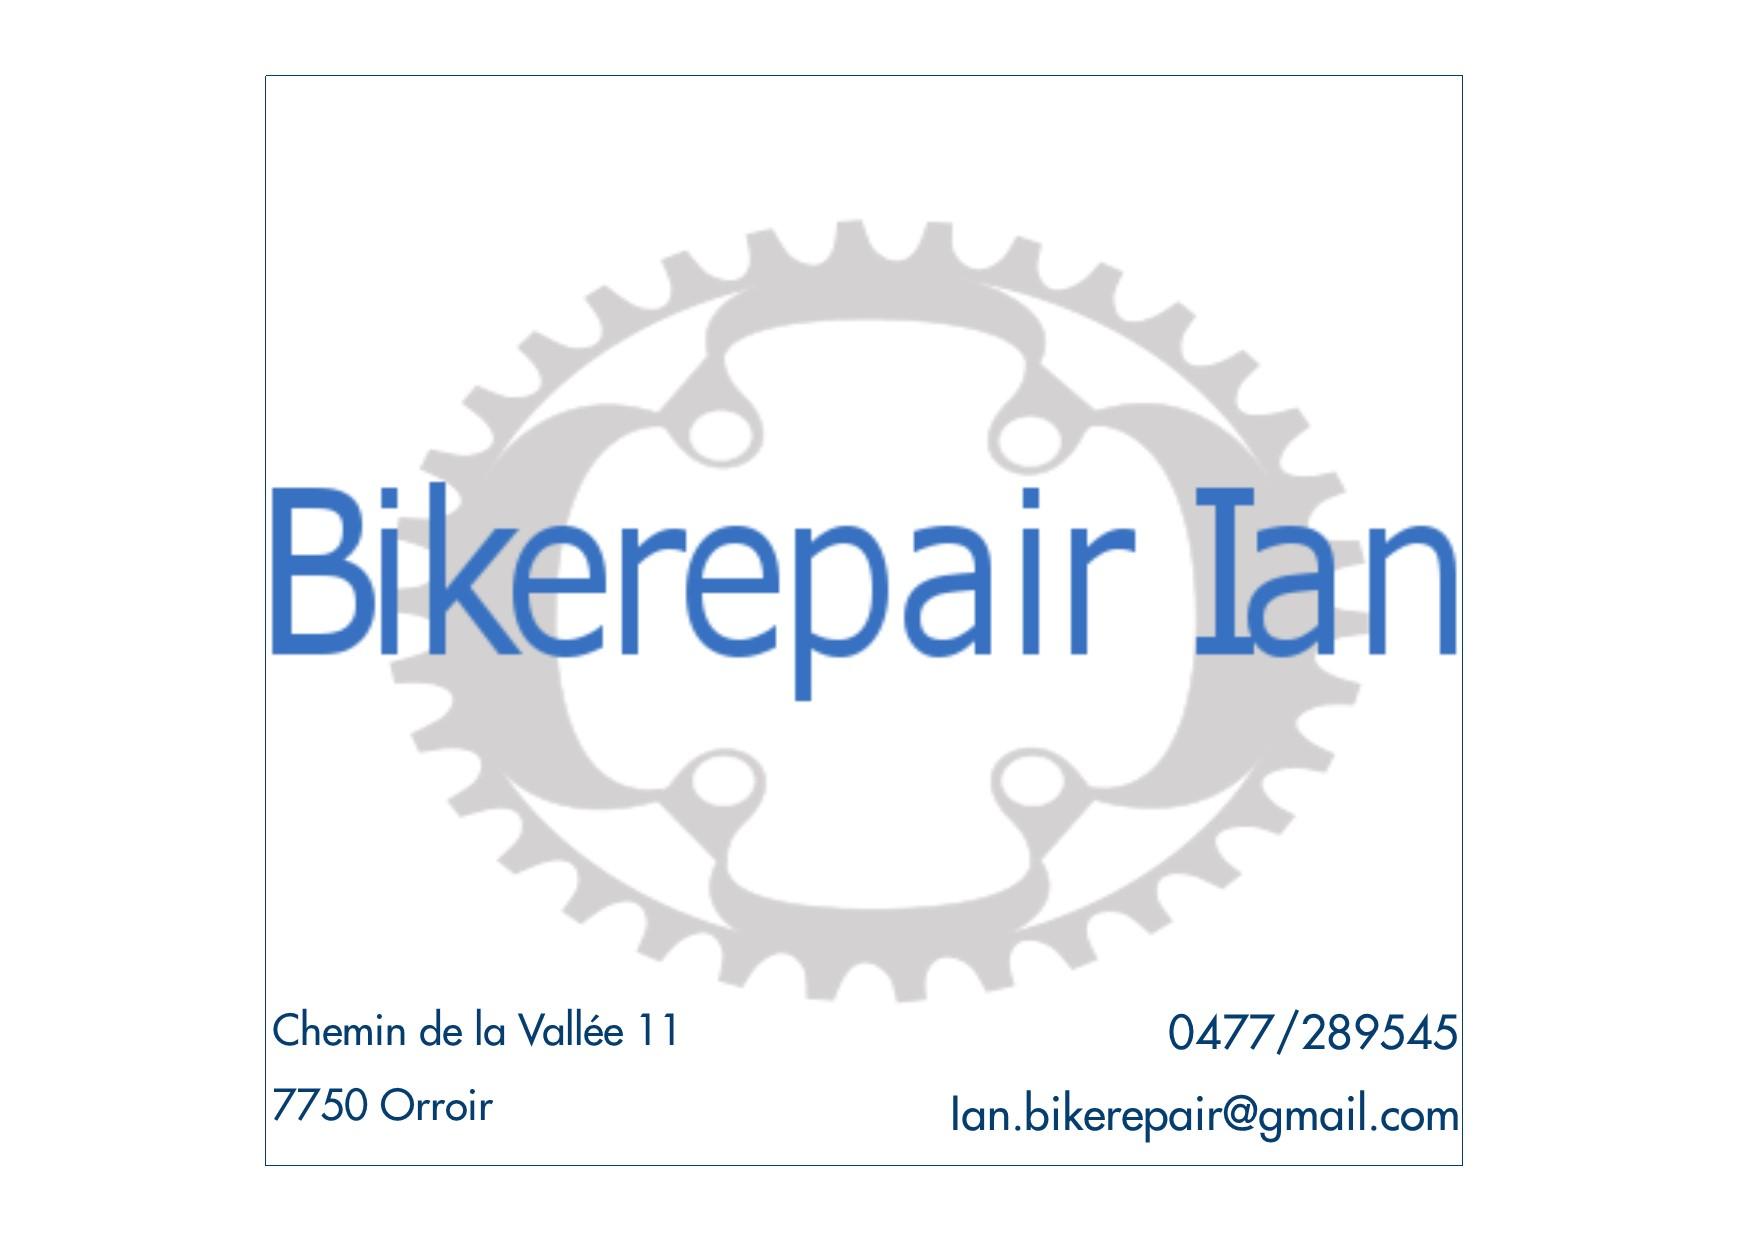 Logo Bikerepair-Ian